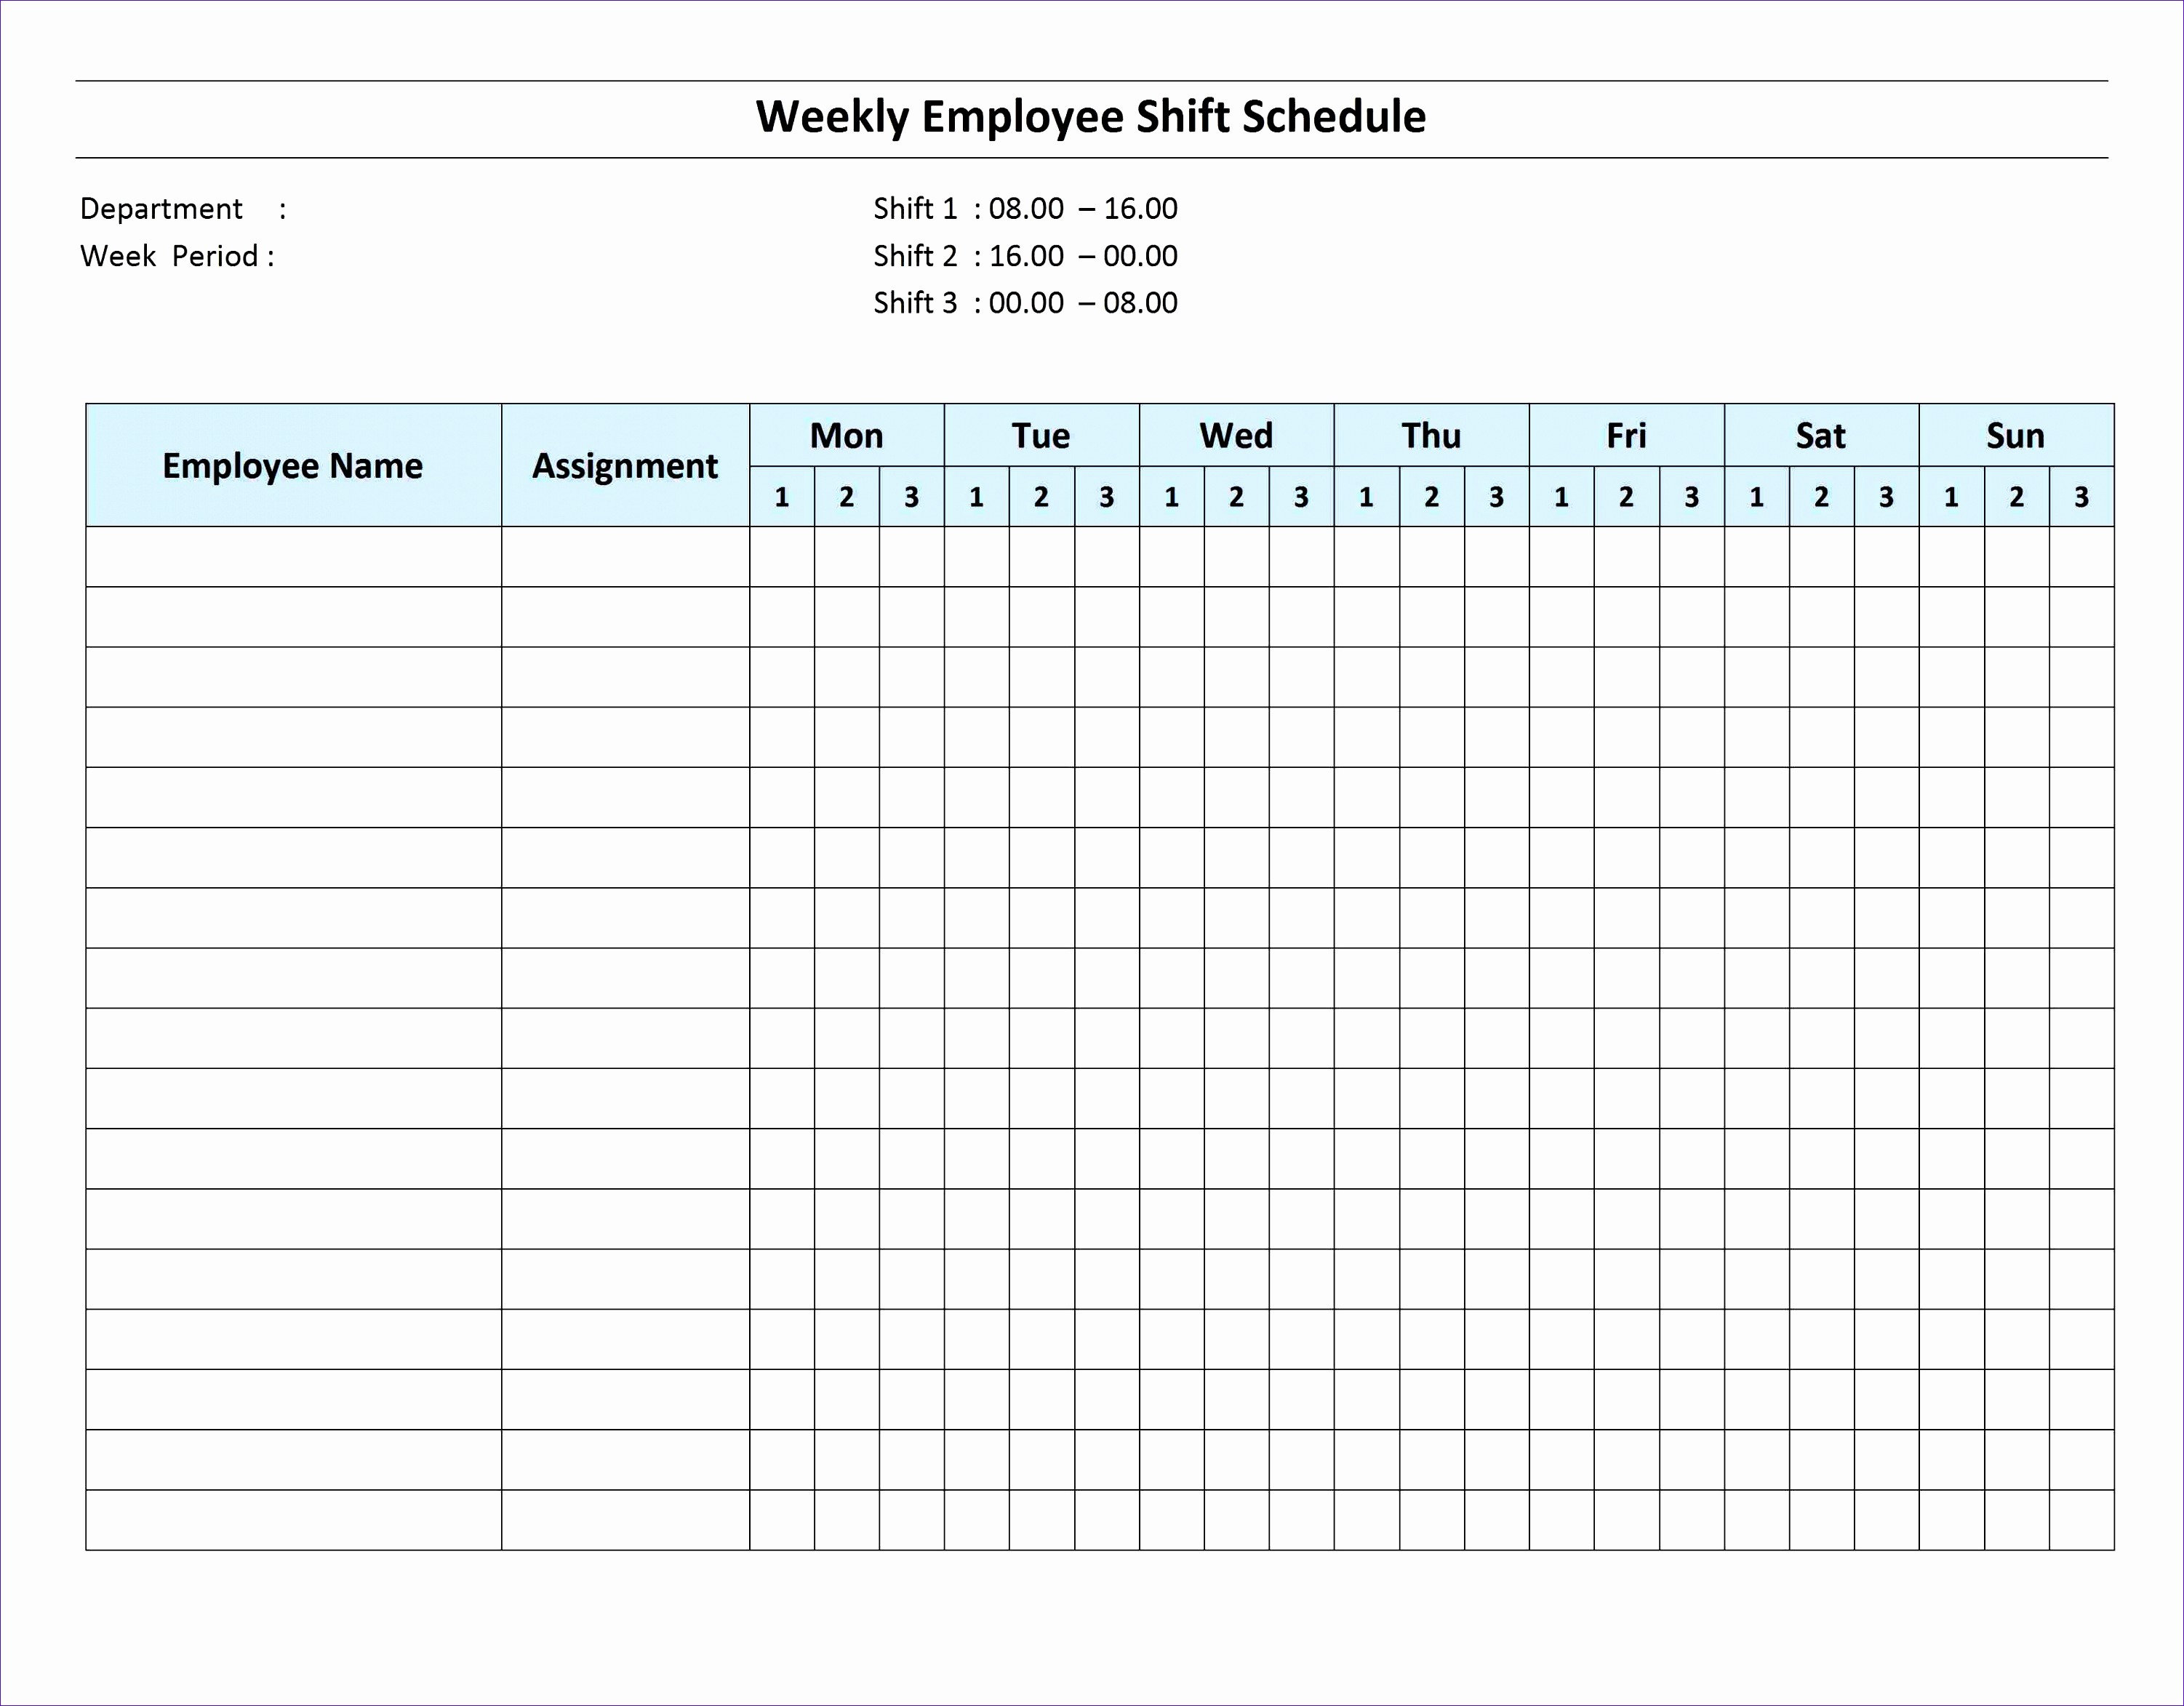 Monthly Work Schedule Template Excel Inspirational 10 Excel Monthly Work Schedule Template Exceltemplates